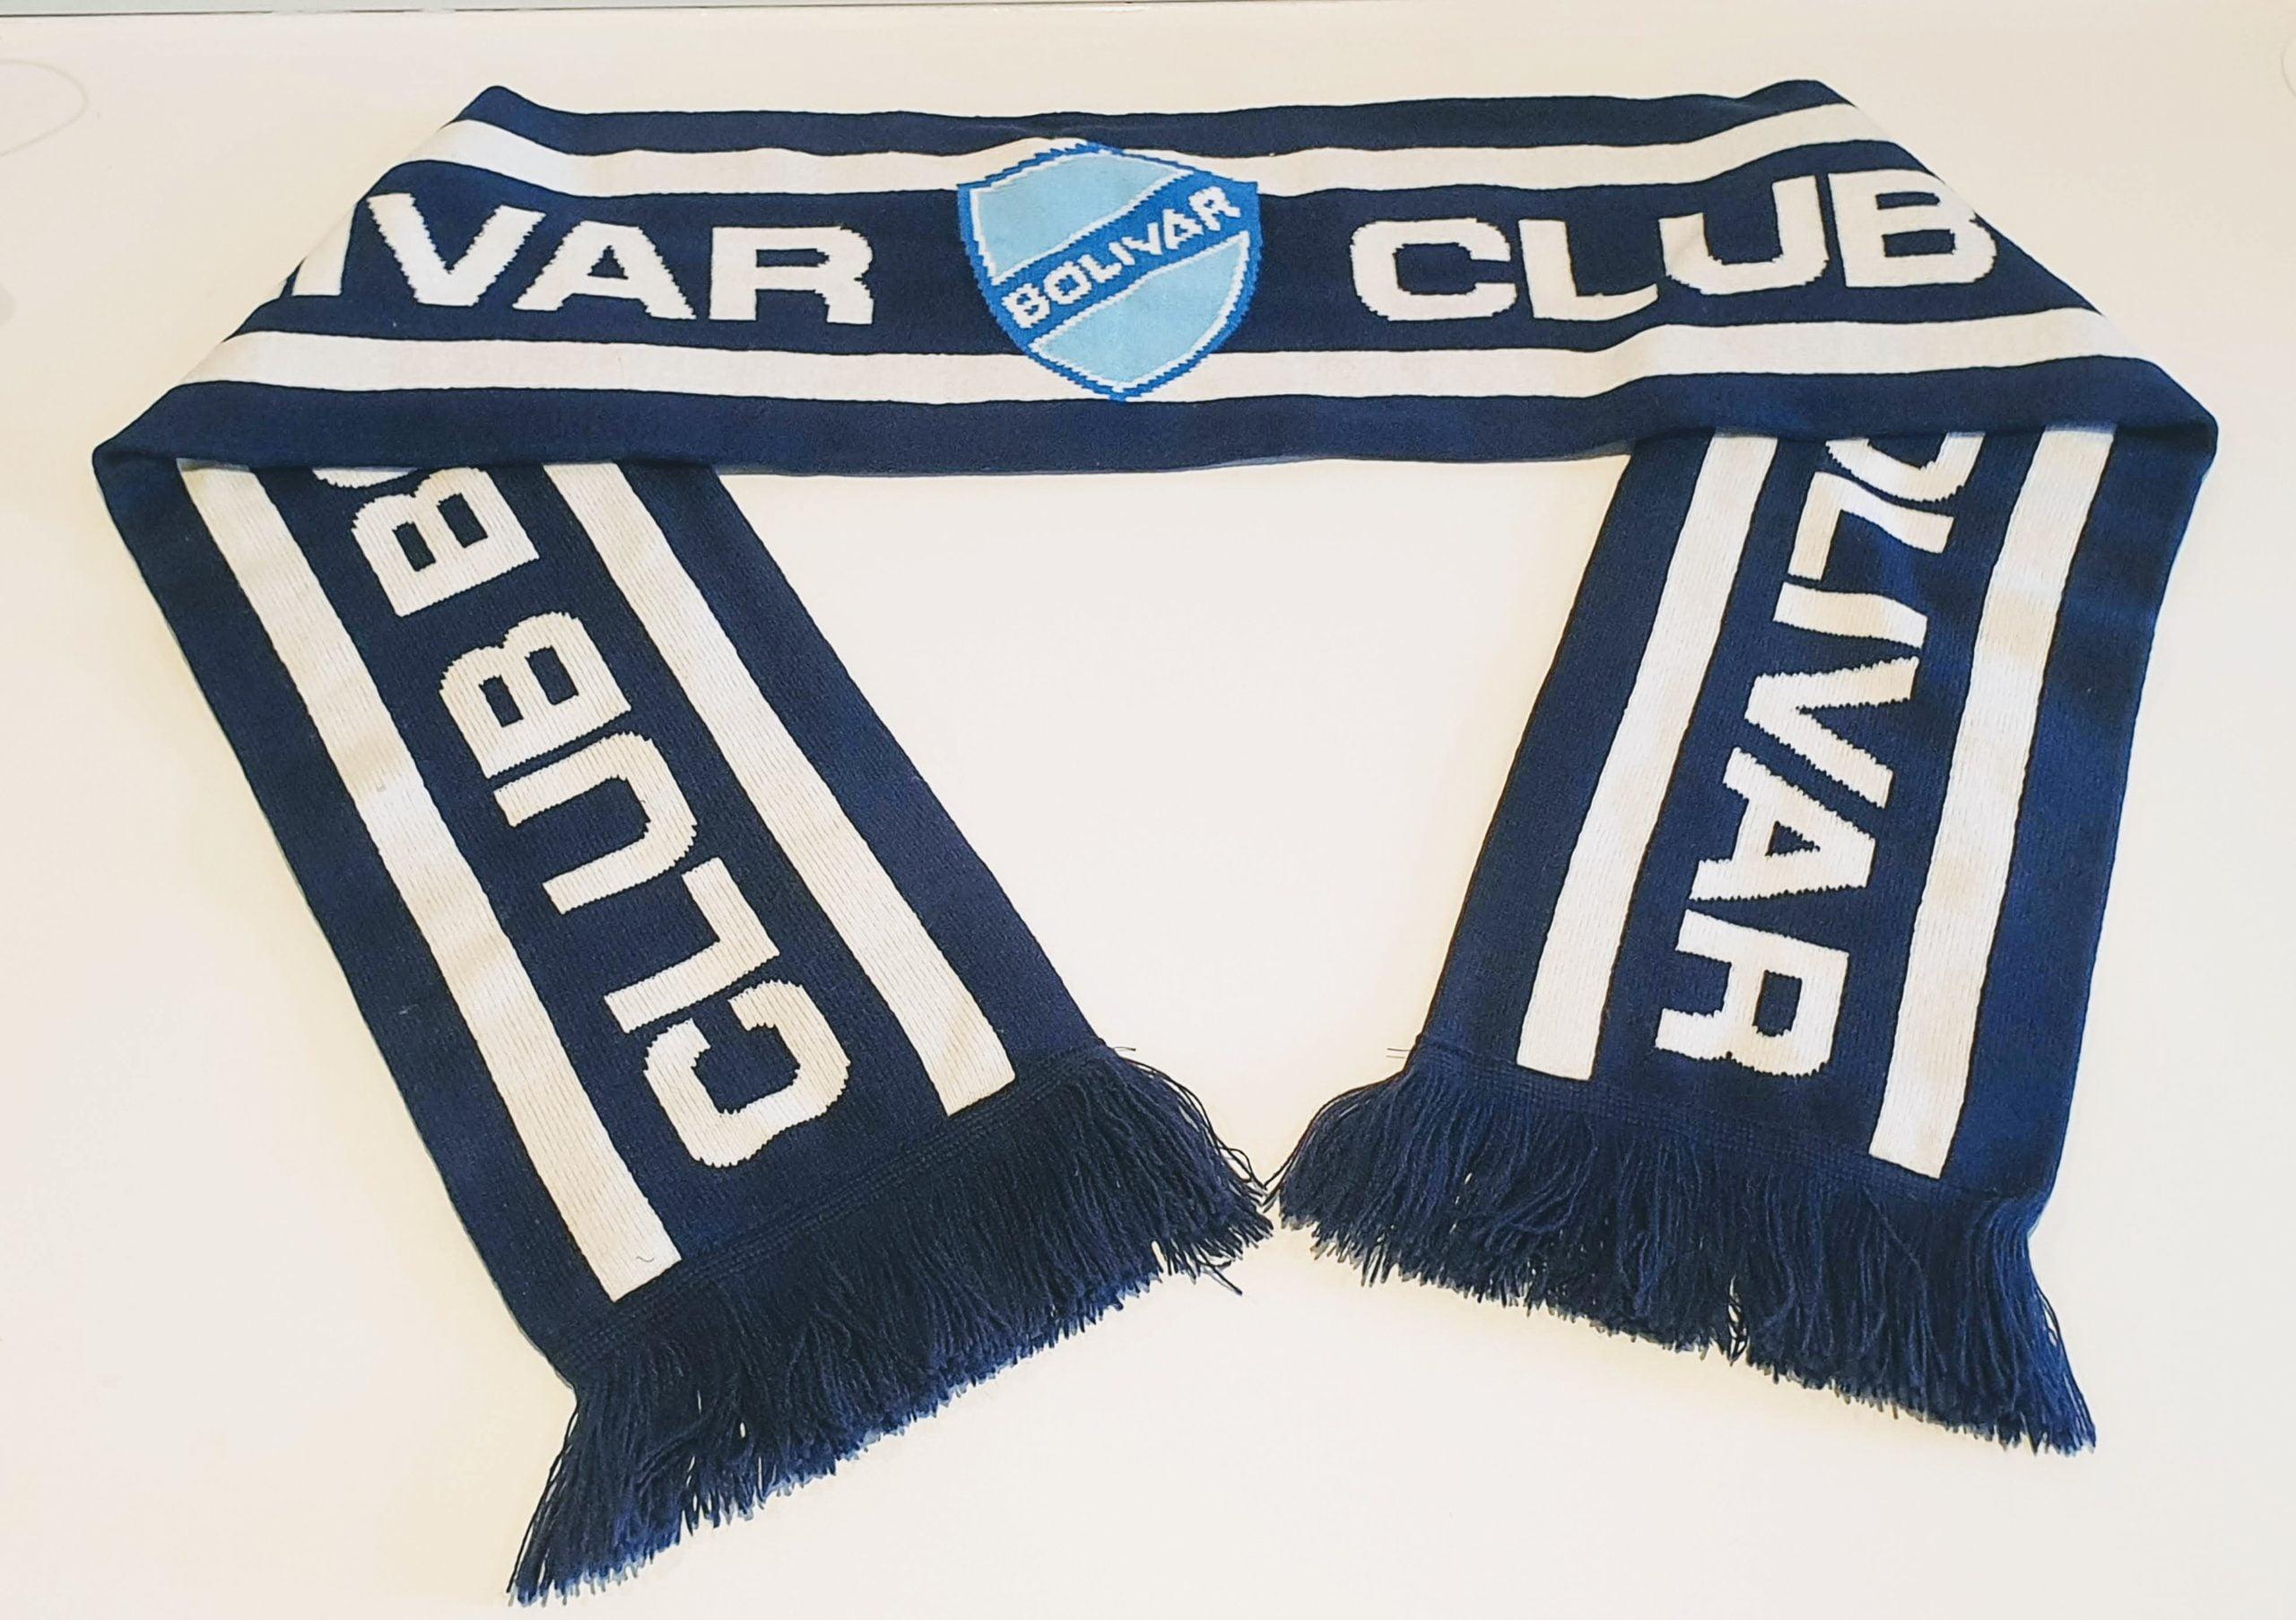 Football Club Scarves